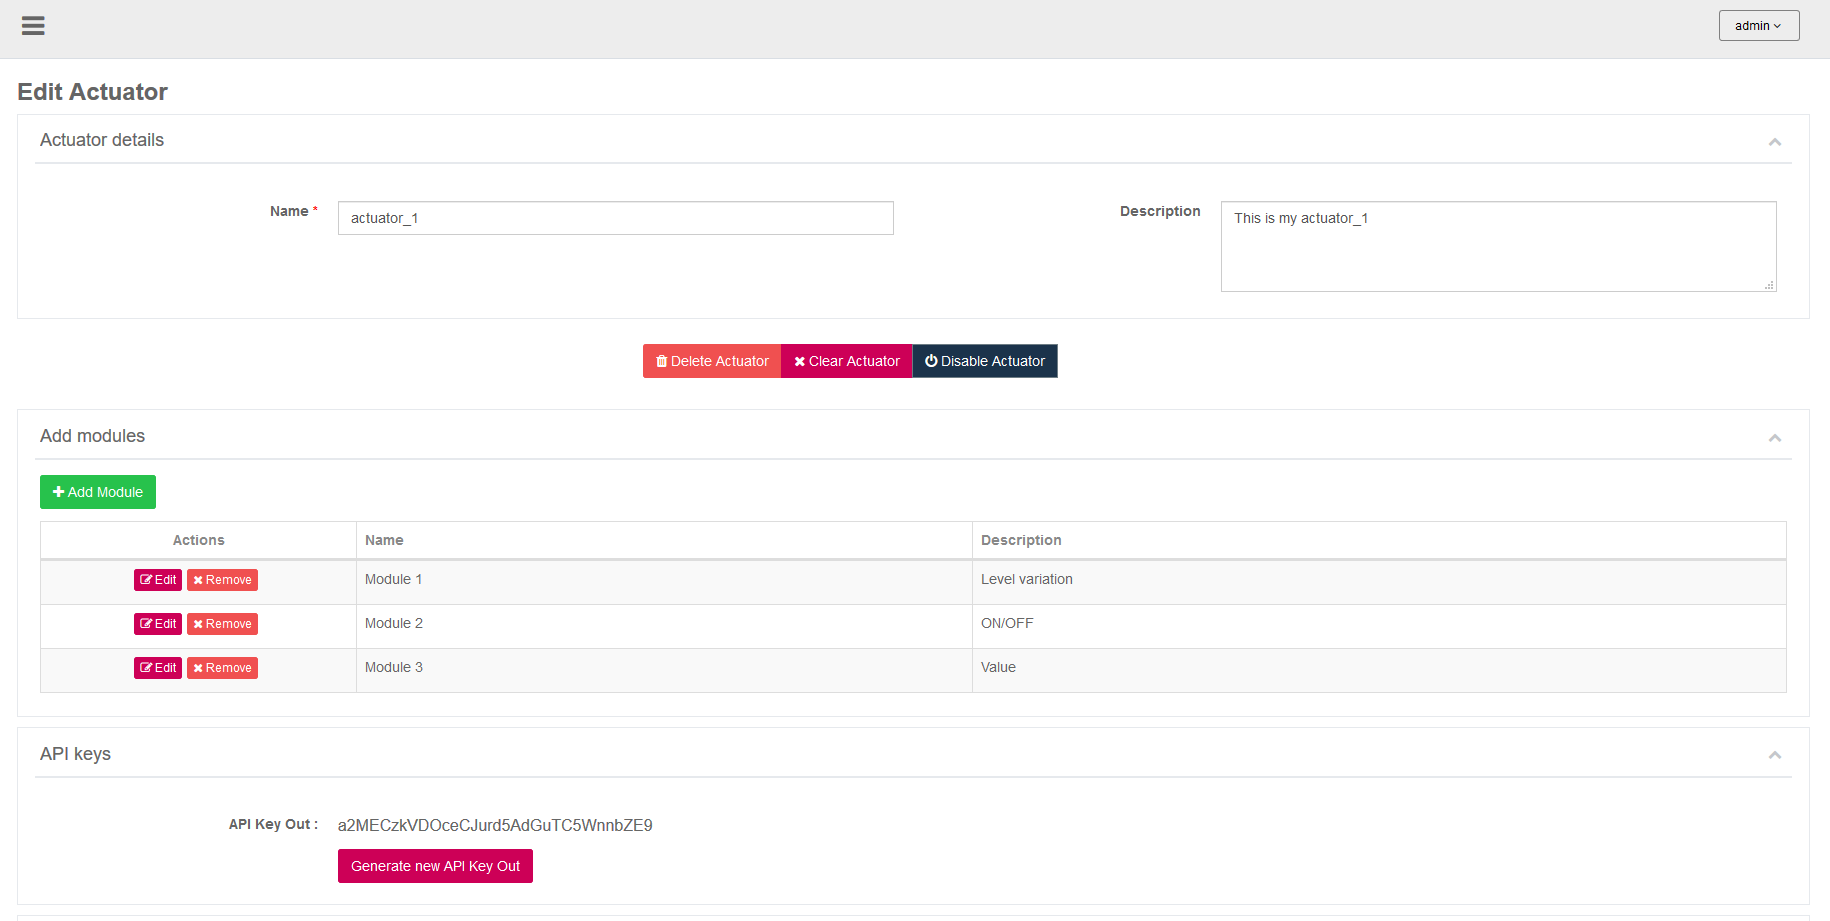 AskSensors : Edit Actuator